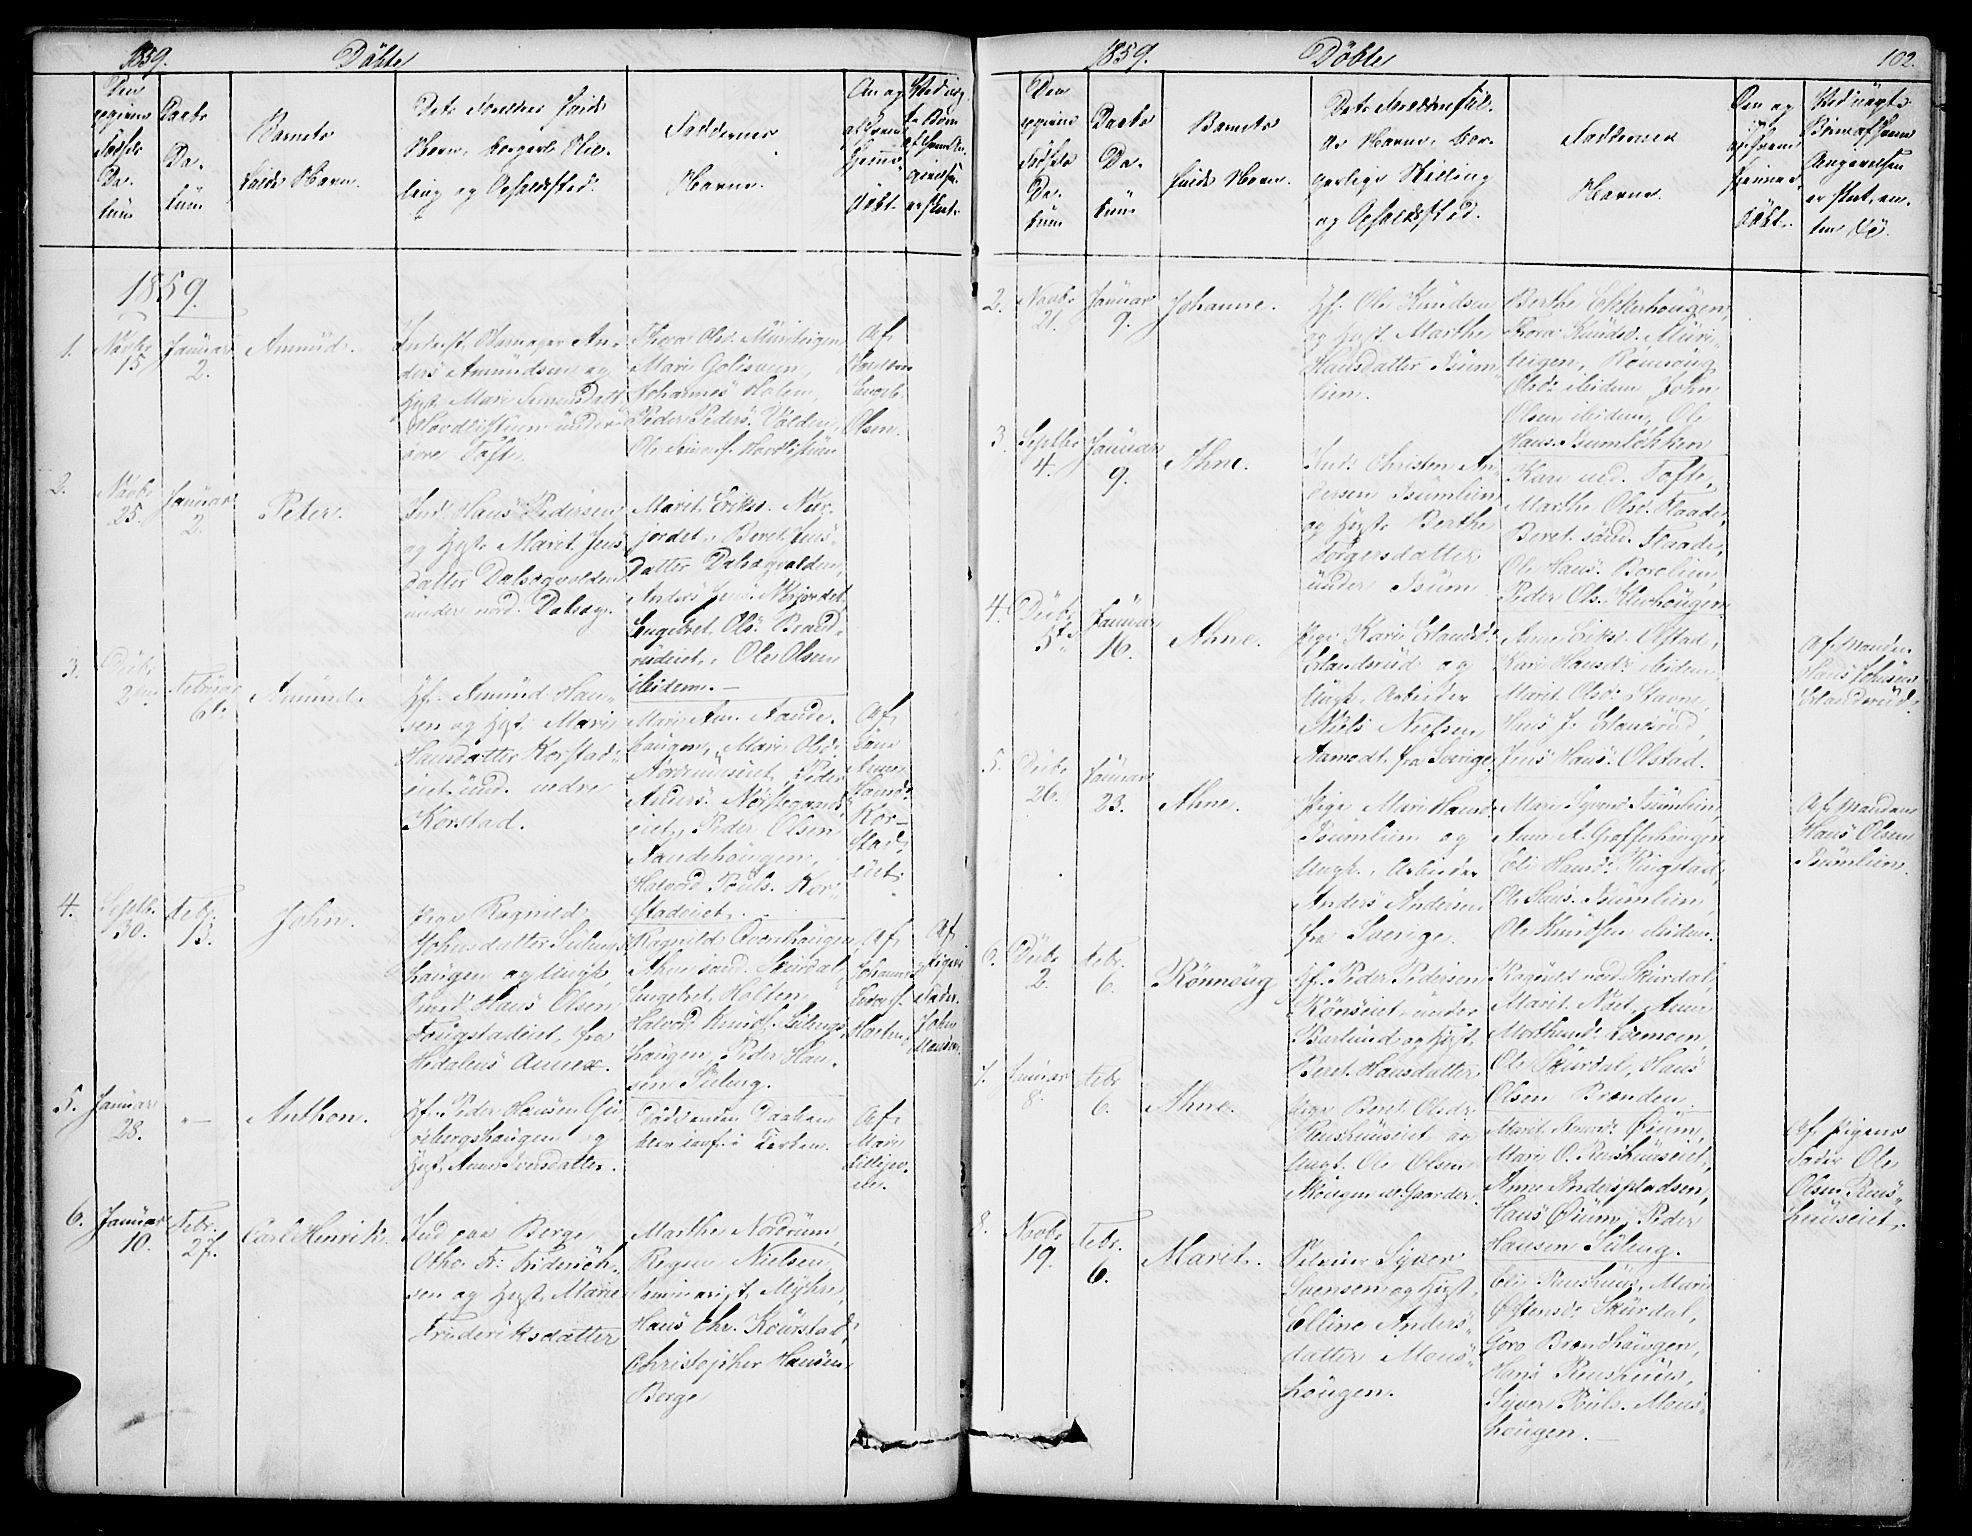 SAH, Sør-Fron prestekontor, H/Ha/Hab/L0001: Klokkerbok nr. 1, 1844-1863, s. 102